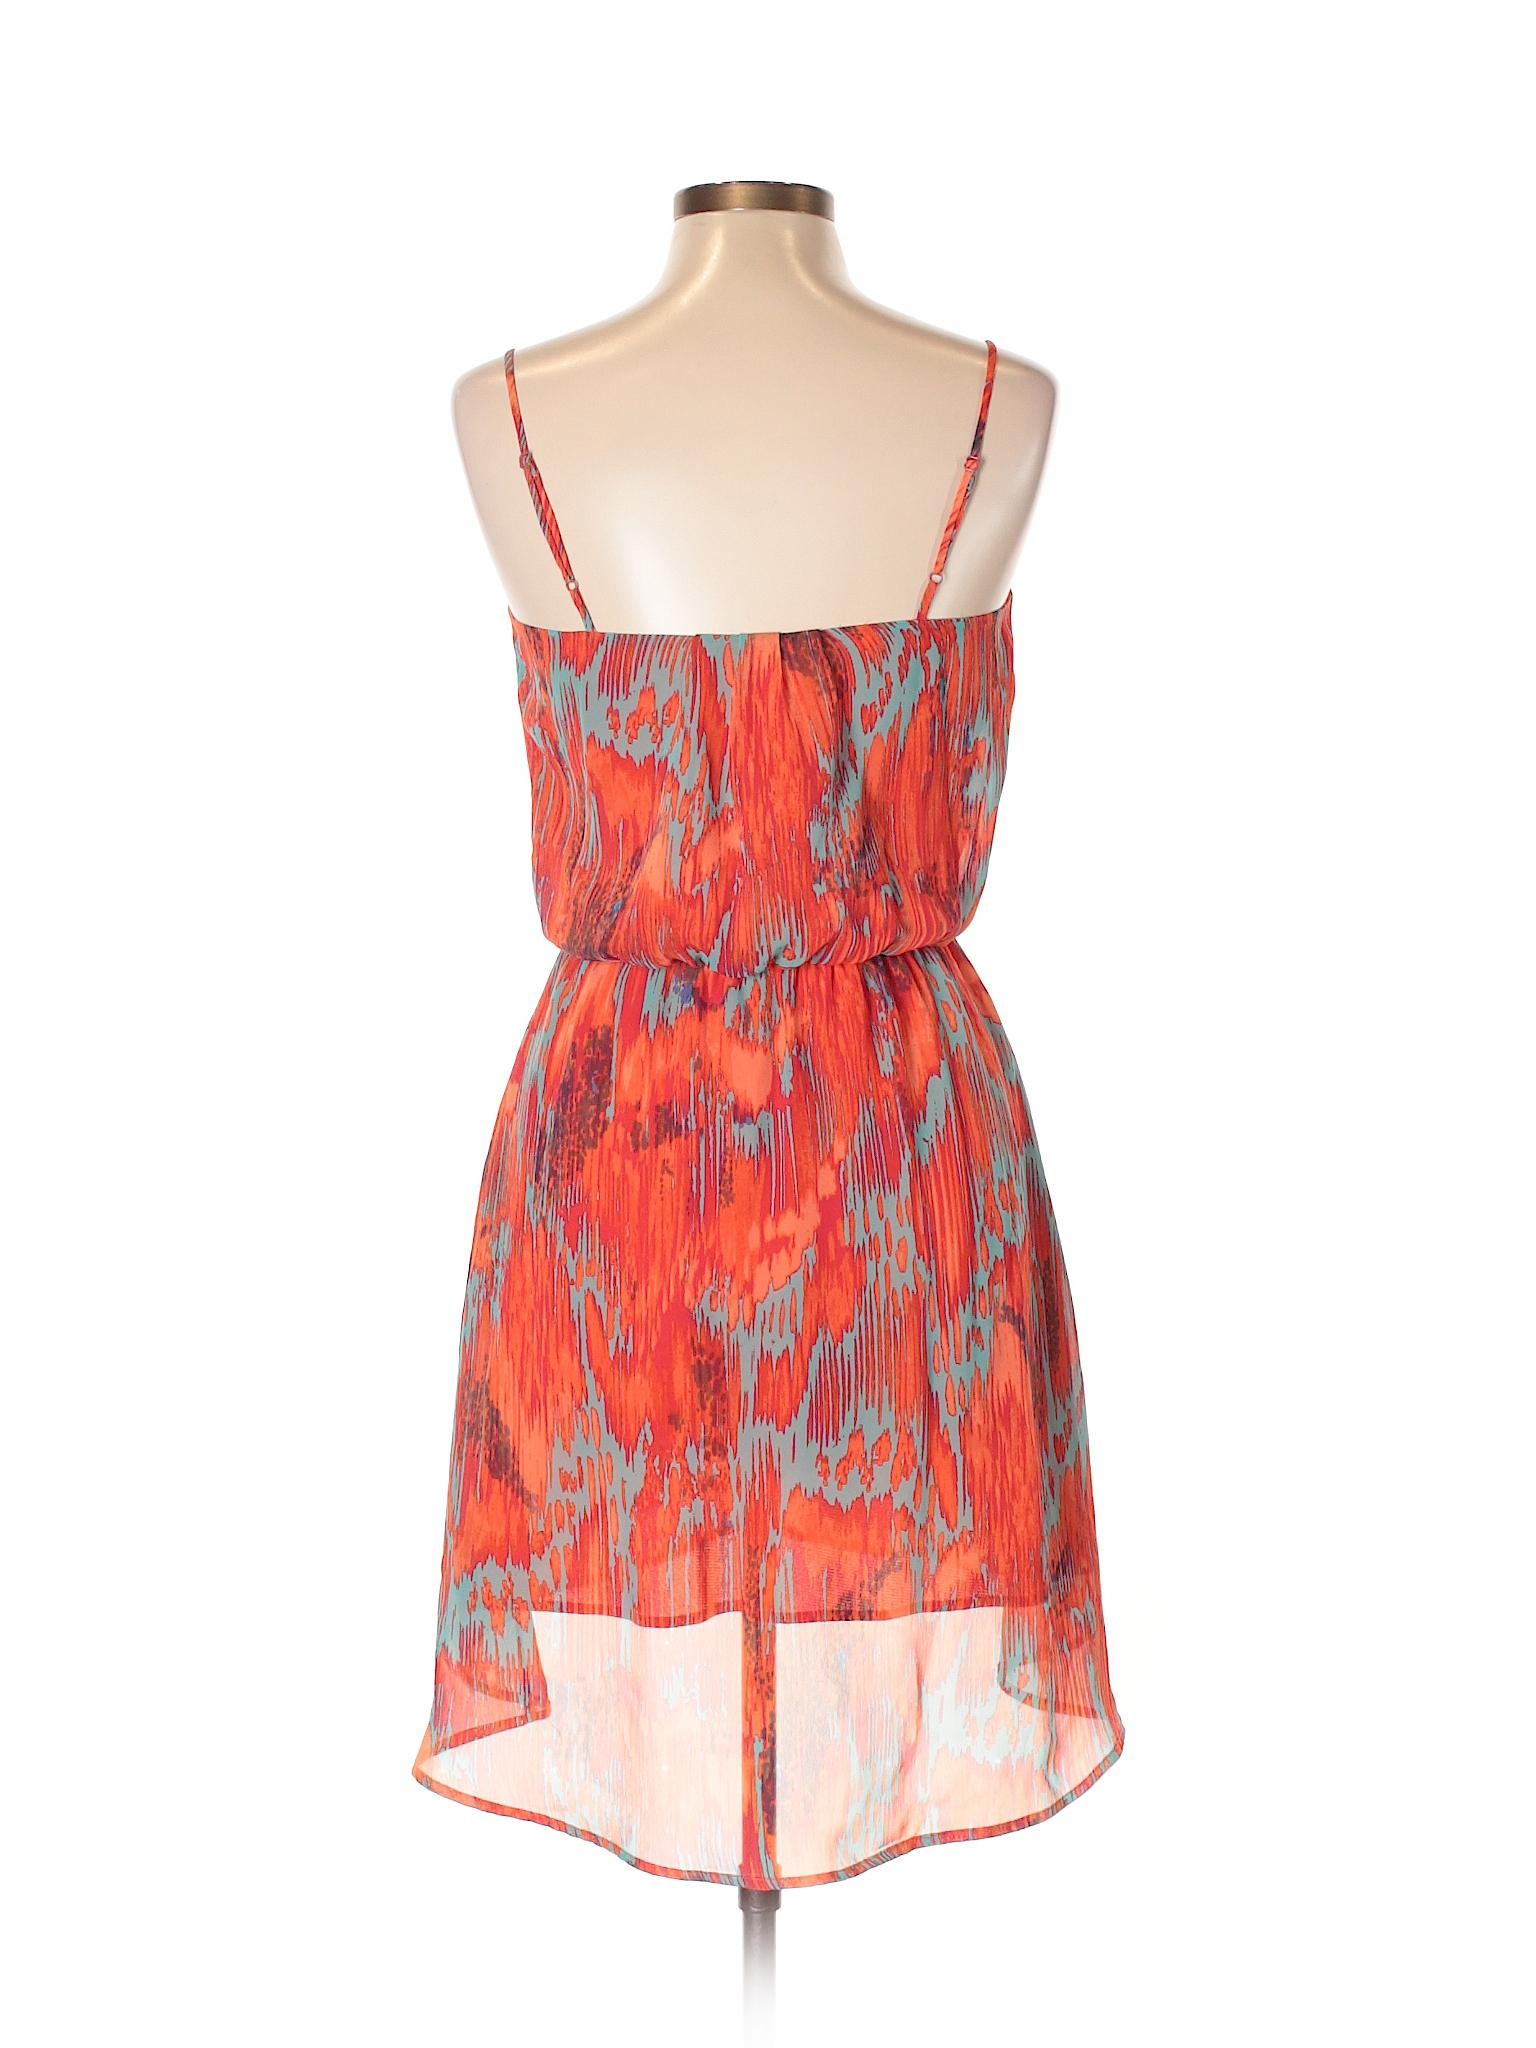 Winter Collective Concepts Boutique Casual Dress gdRP0qw